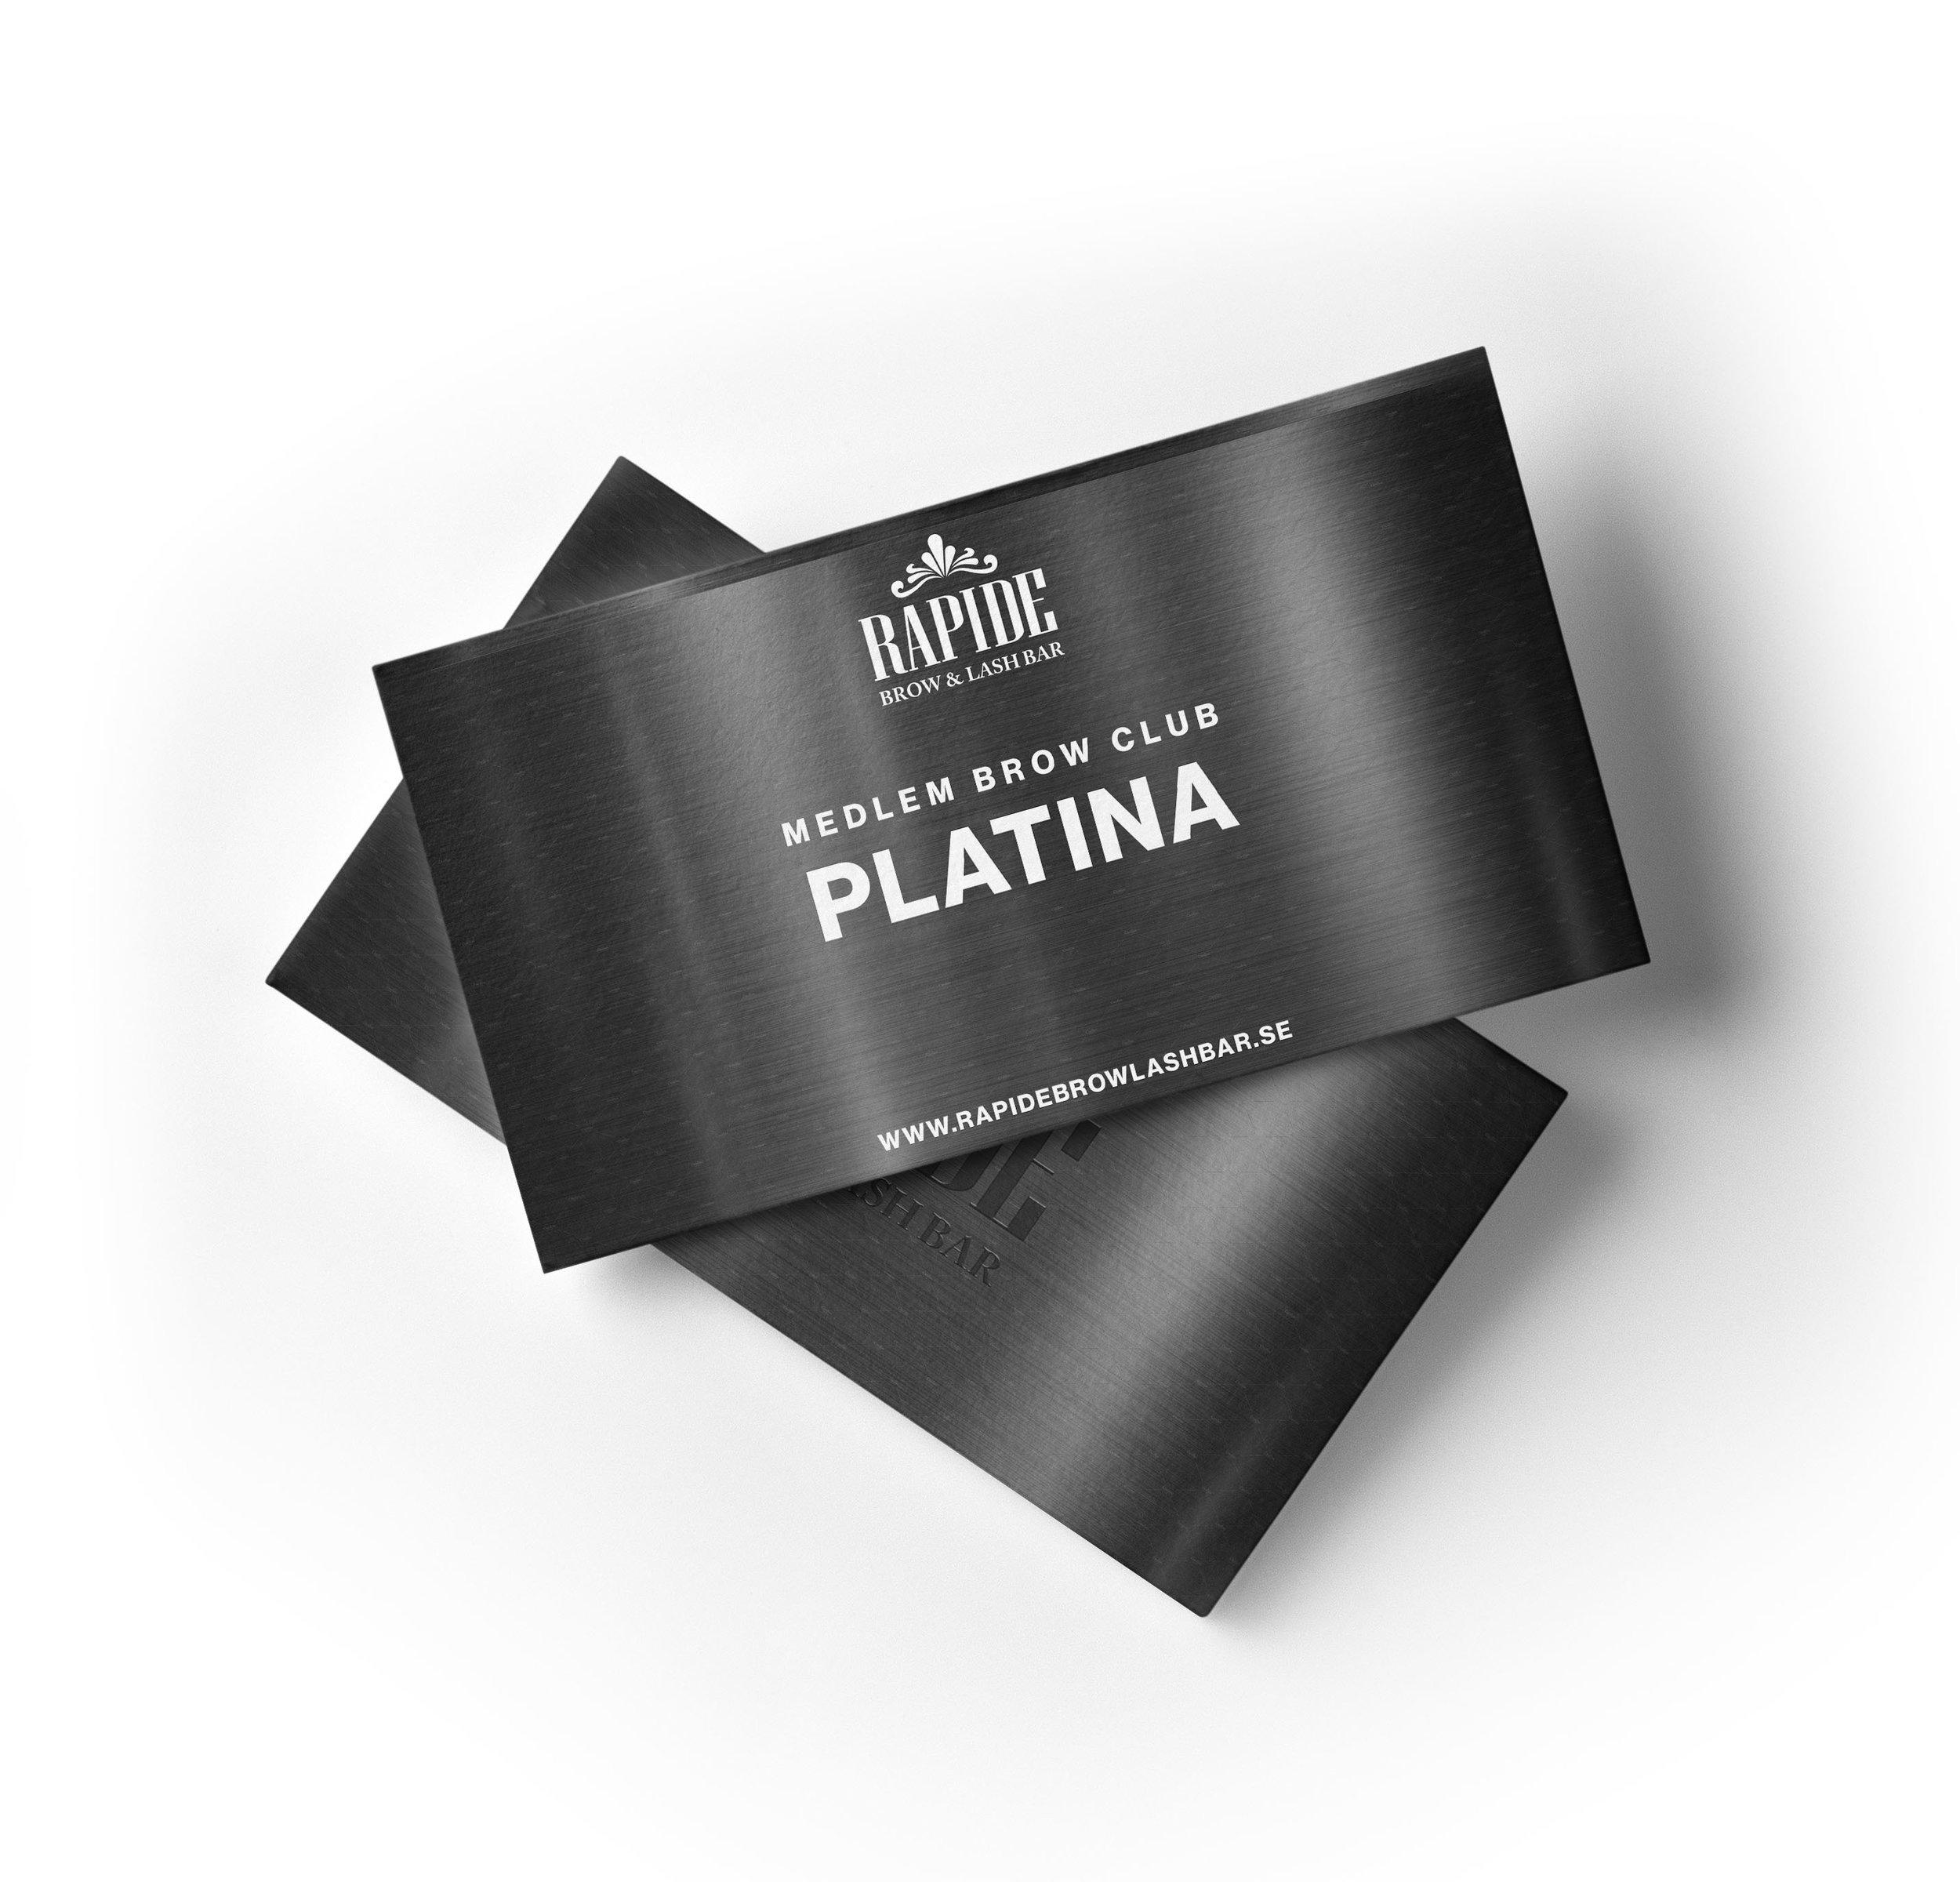 platina2.jpg